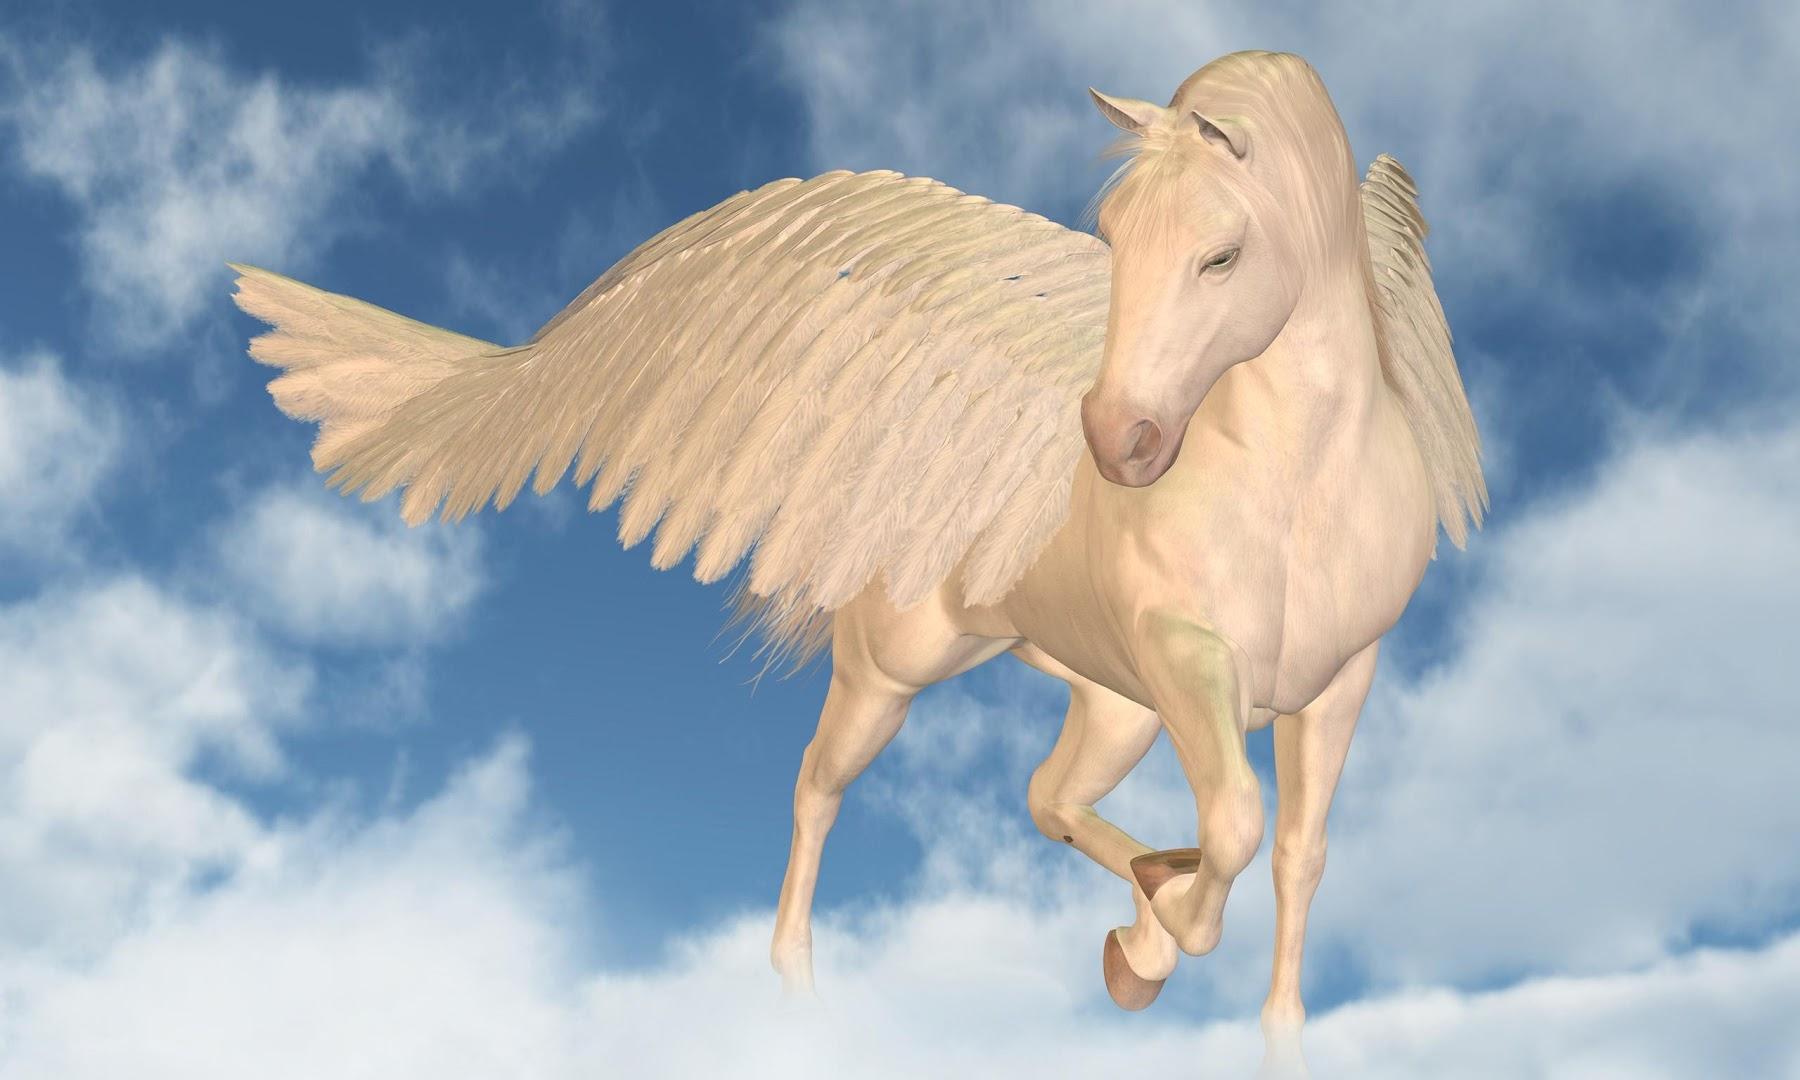 unicorn pegasus live wallpaper google play store revenue